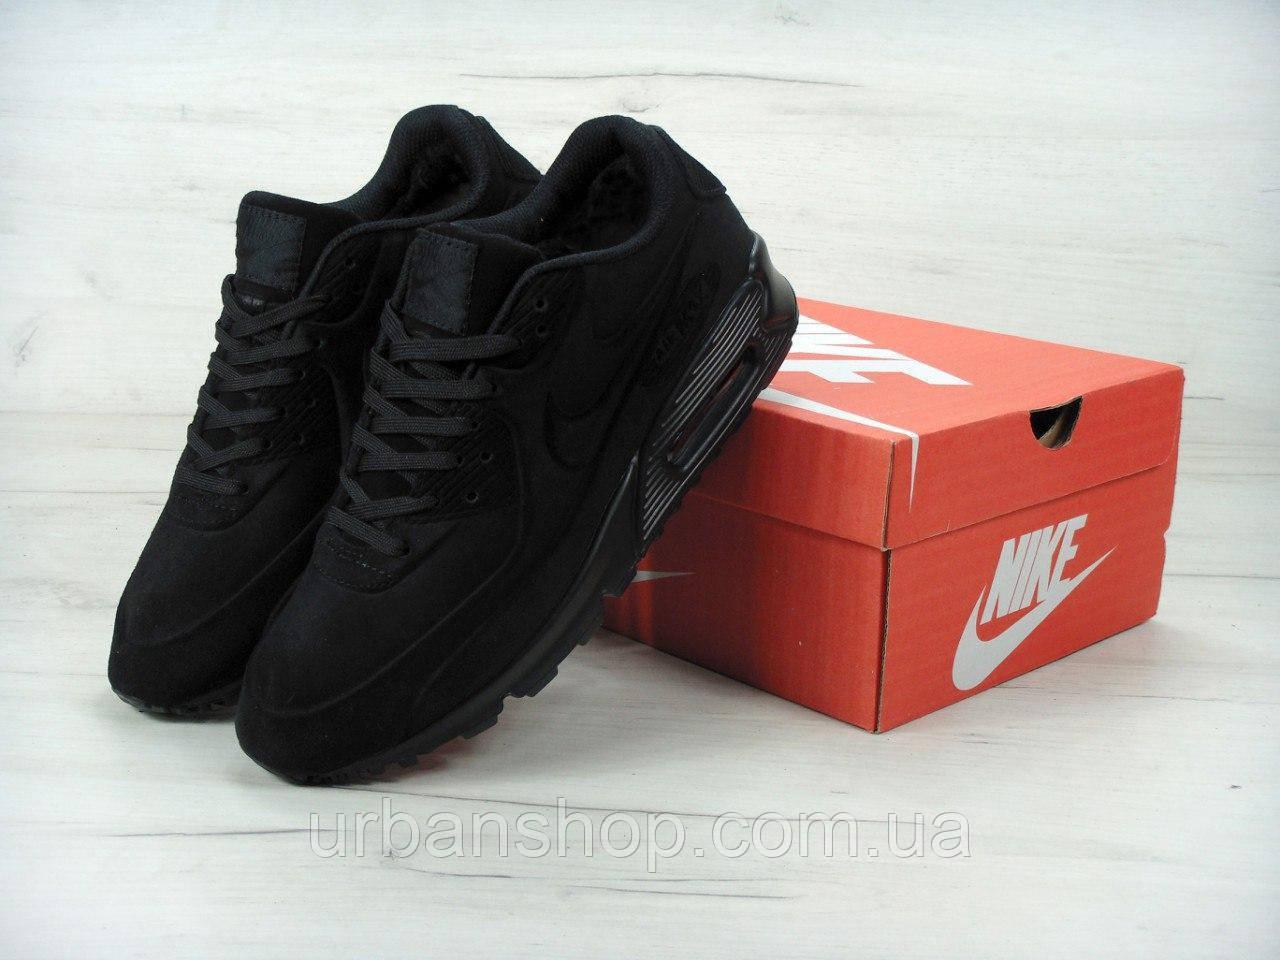 3785031e Зимние мужские кроссовки Nike Air Max 90' VT Tweed